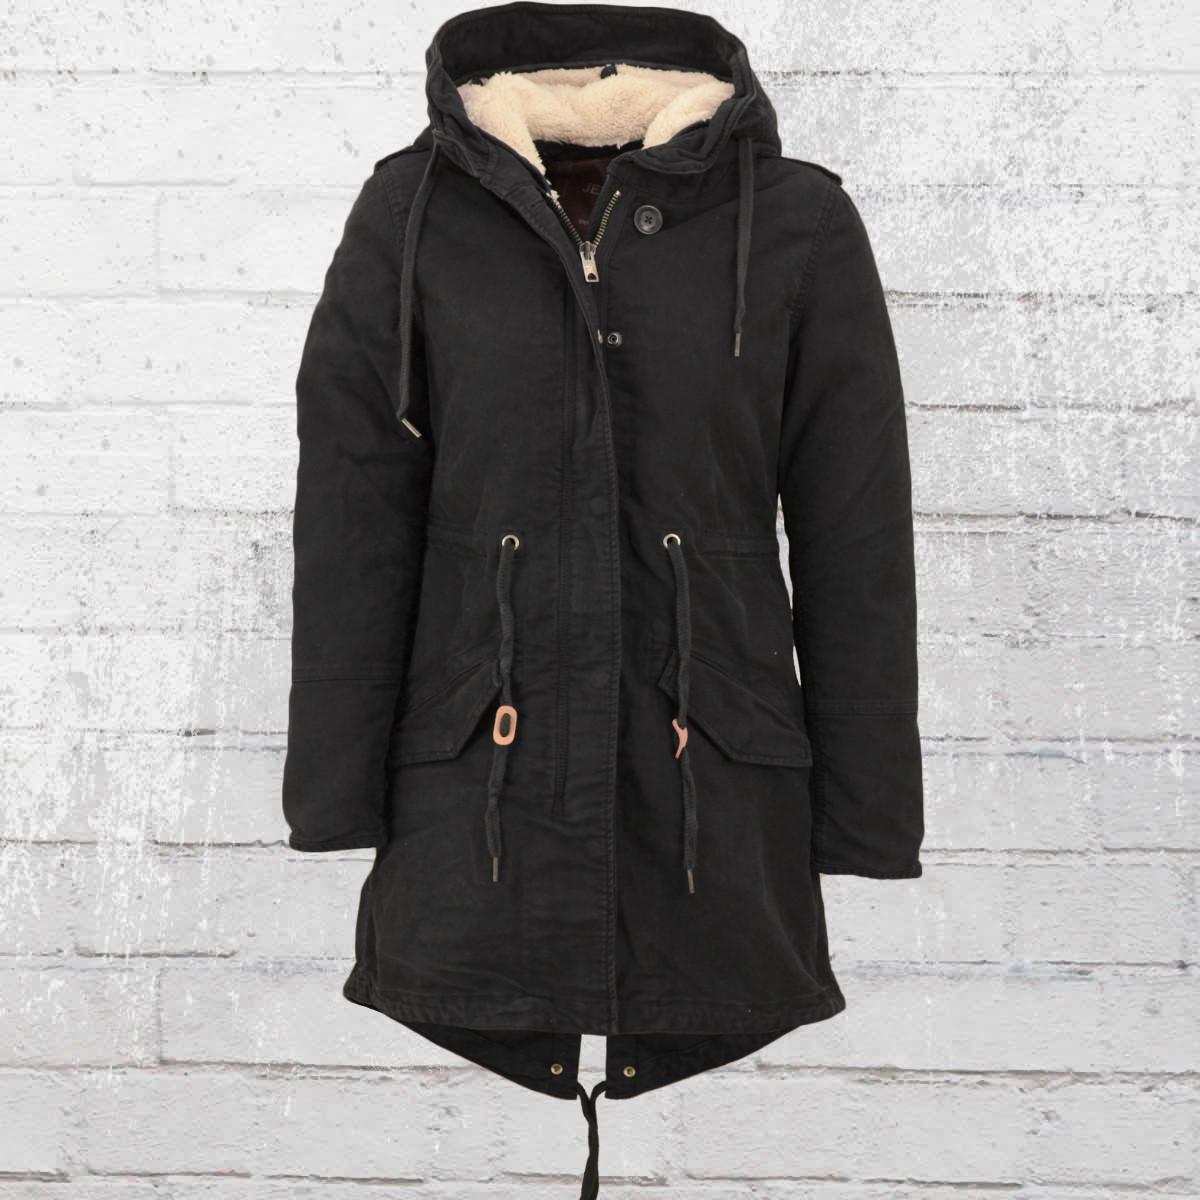 huge discount d3093 28799 Order now | JetLag Womens Parka Jacket FW 120 black